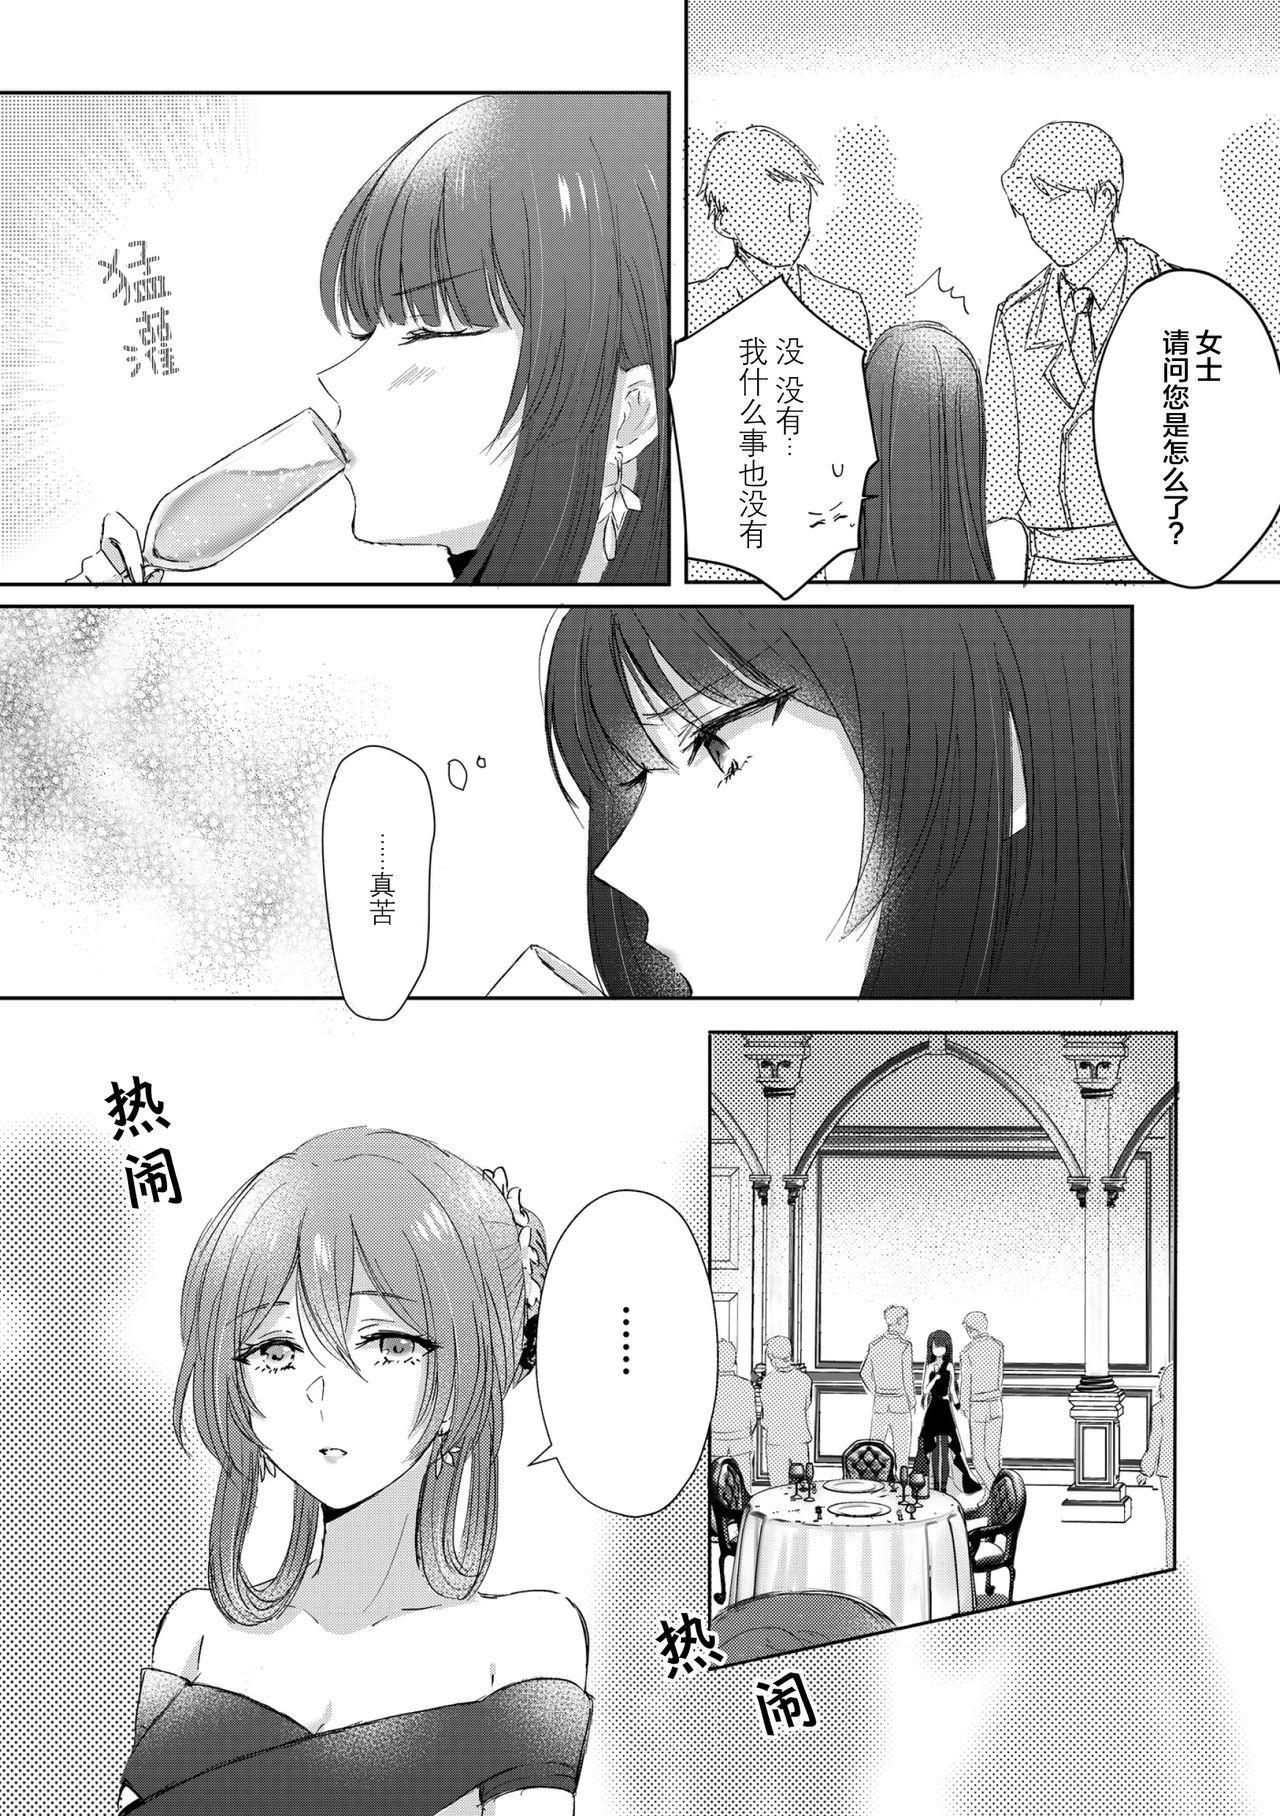 [(Yuri=18L)sui] Alcohol wa Amai (Girls' Frontline) [Chinese]   酒精是甘甜滋味 (少女前線) [提黄灯喵汉化组] 6